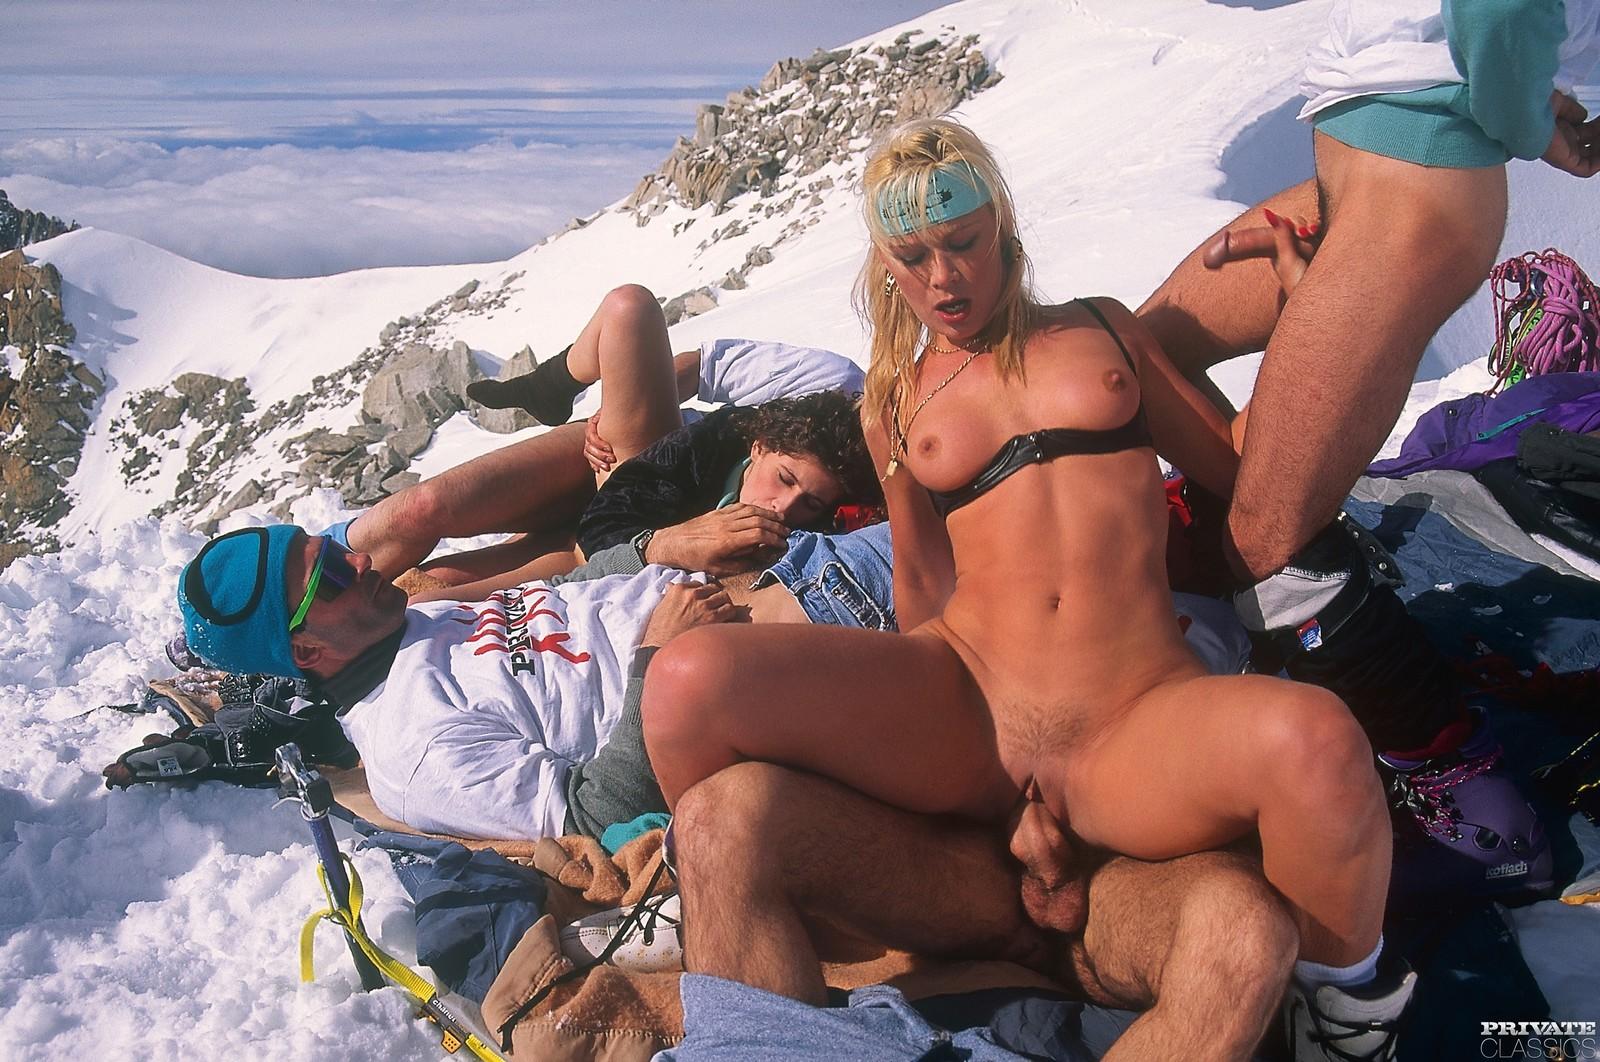 Трахнул на горнолыжном курорте — 15